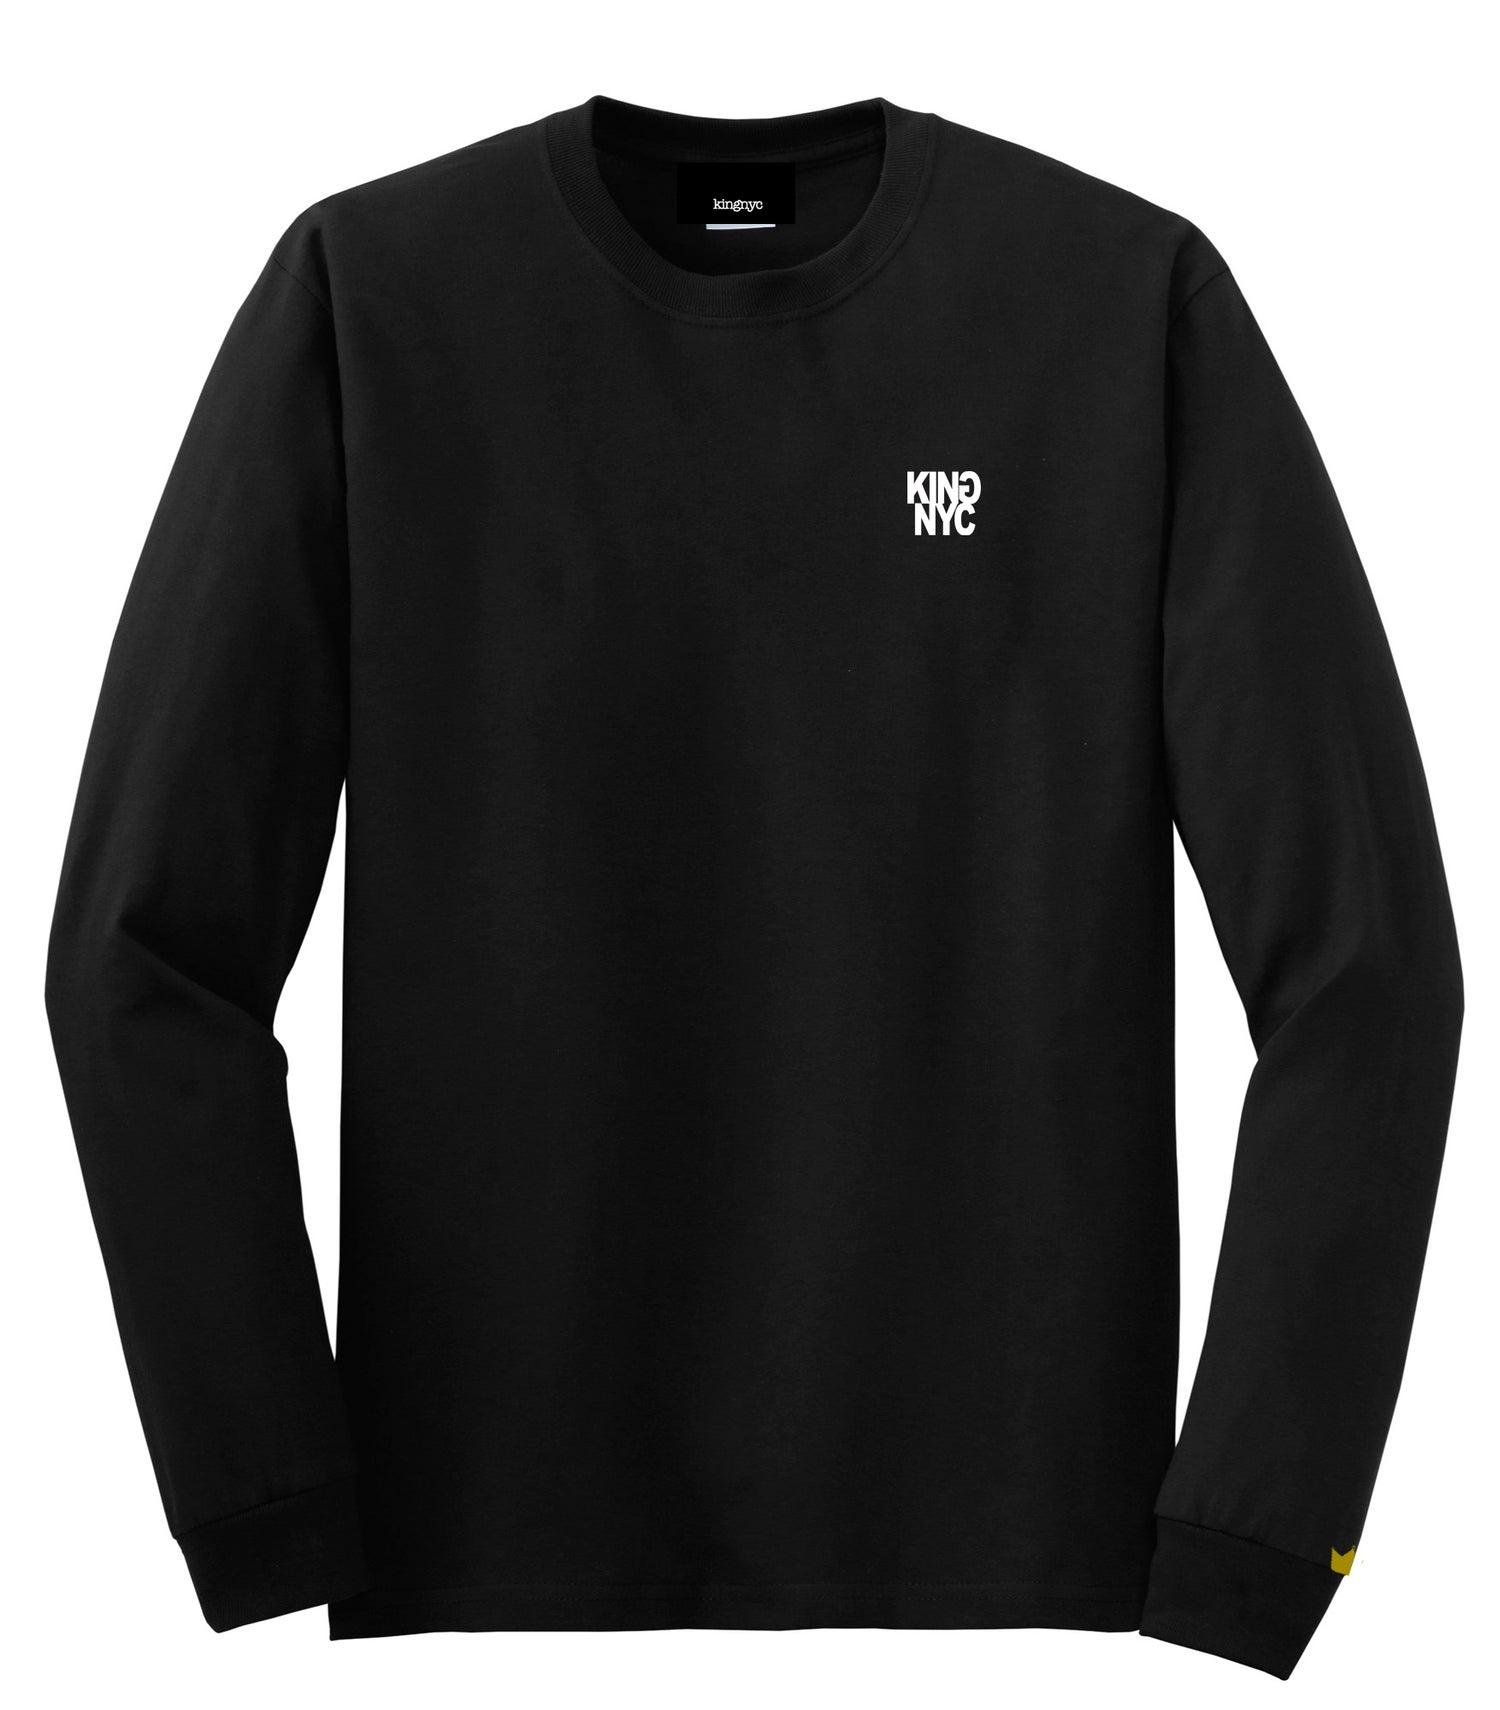 Image of KingNYC Reversed G LS T-Shirt